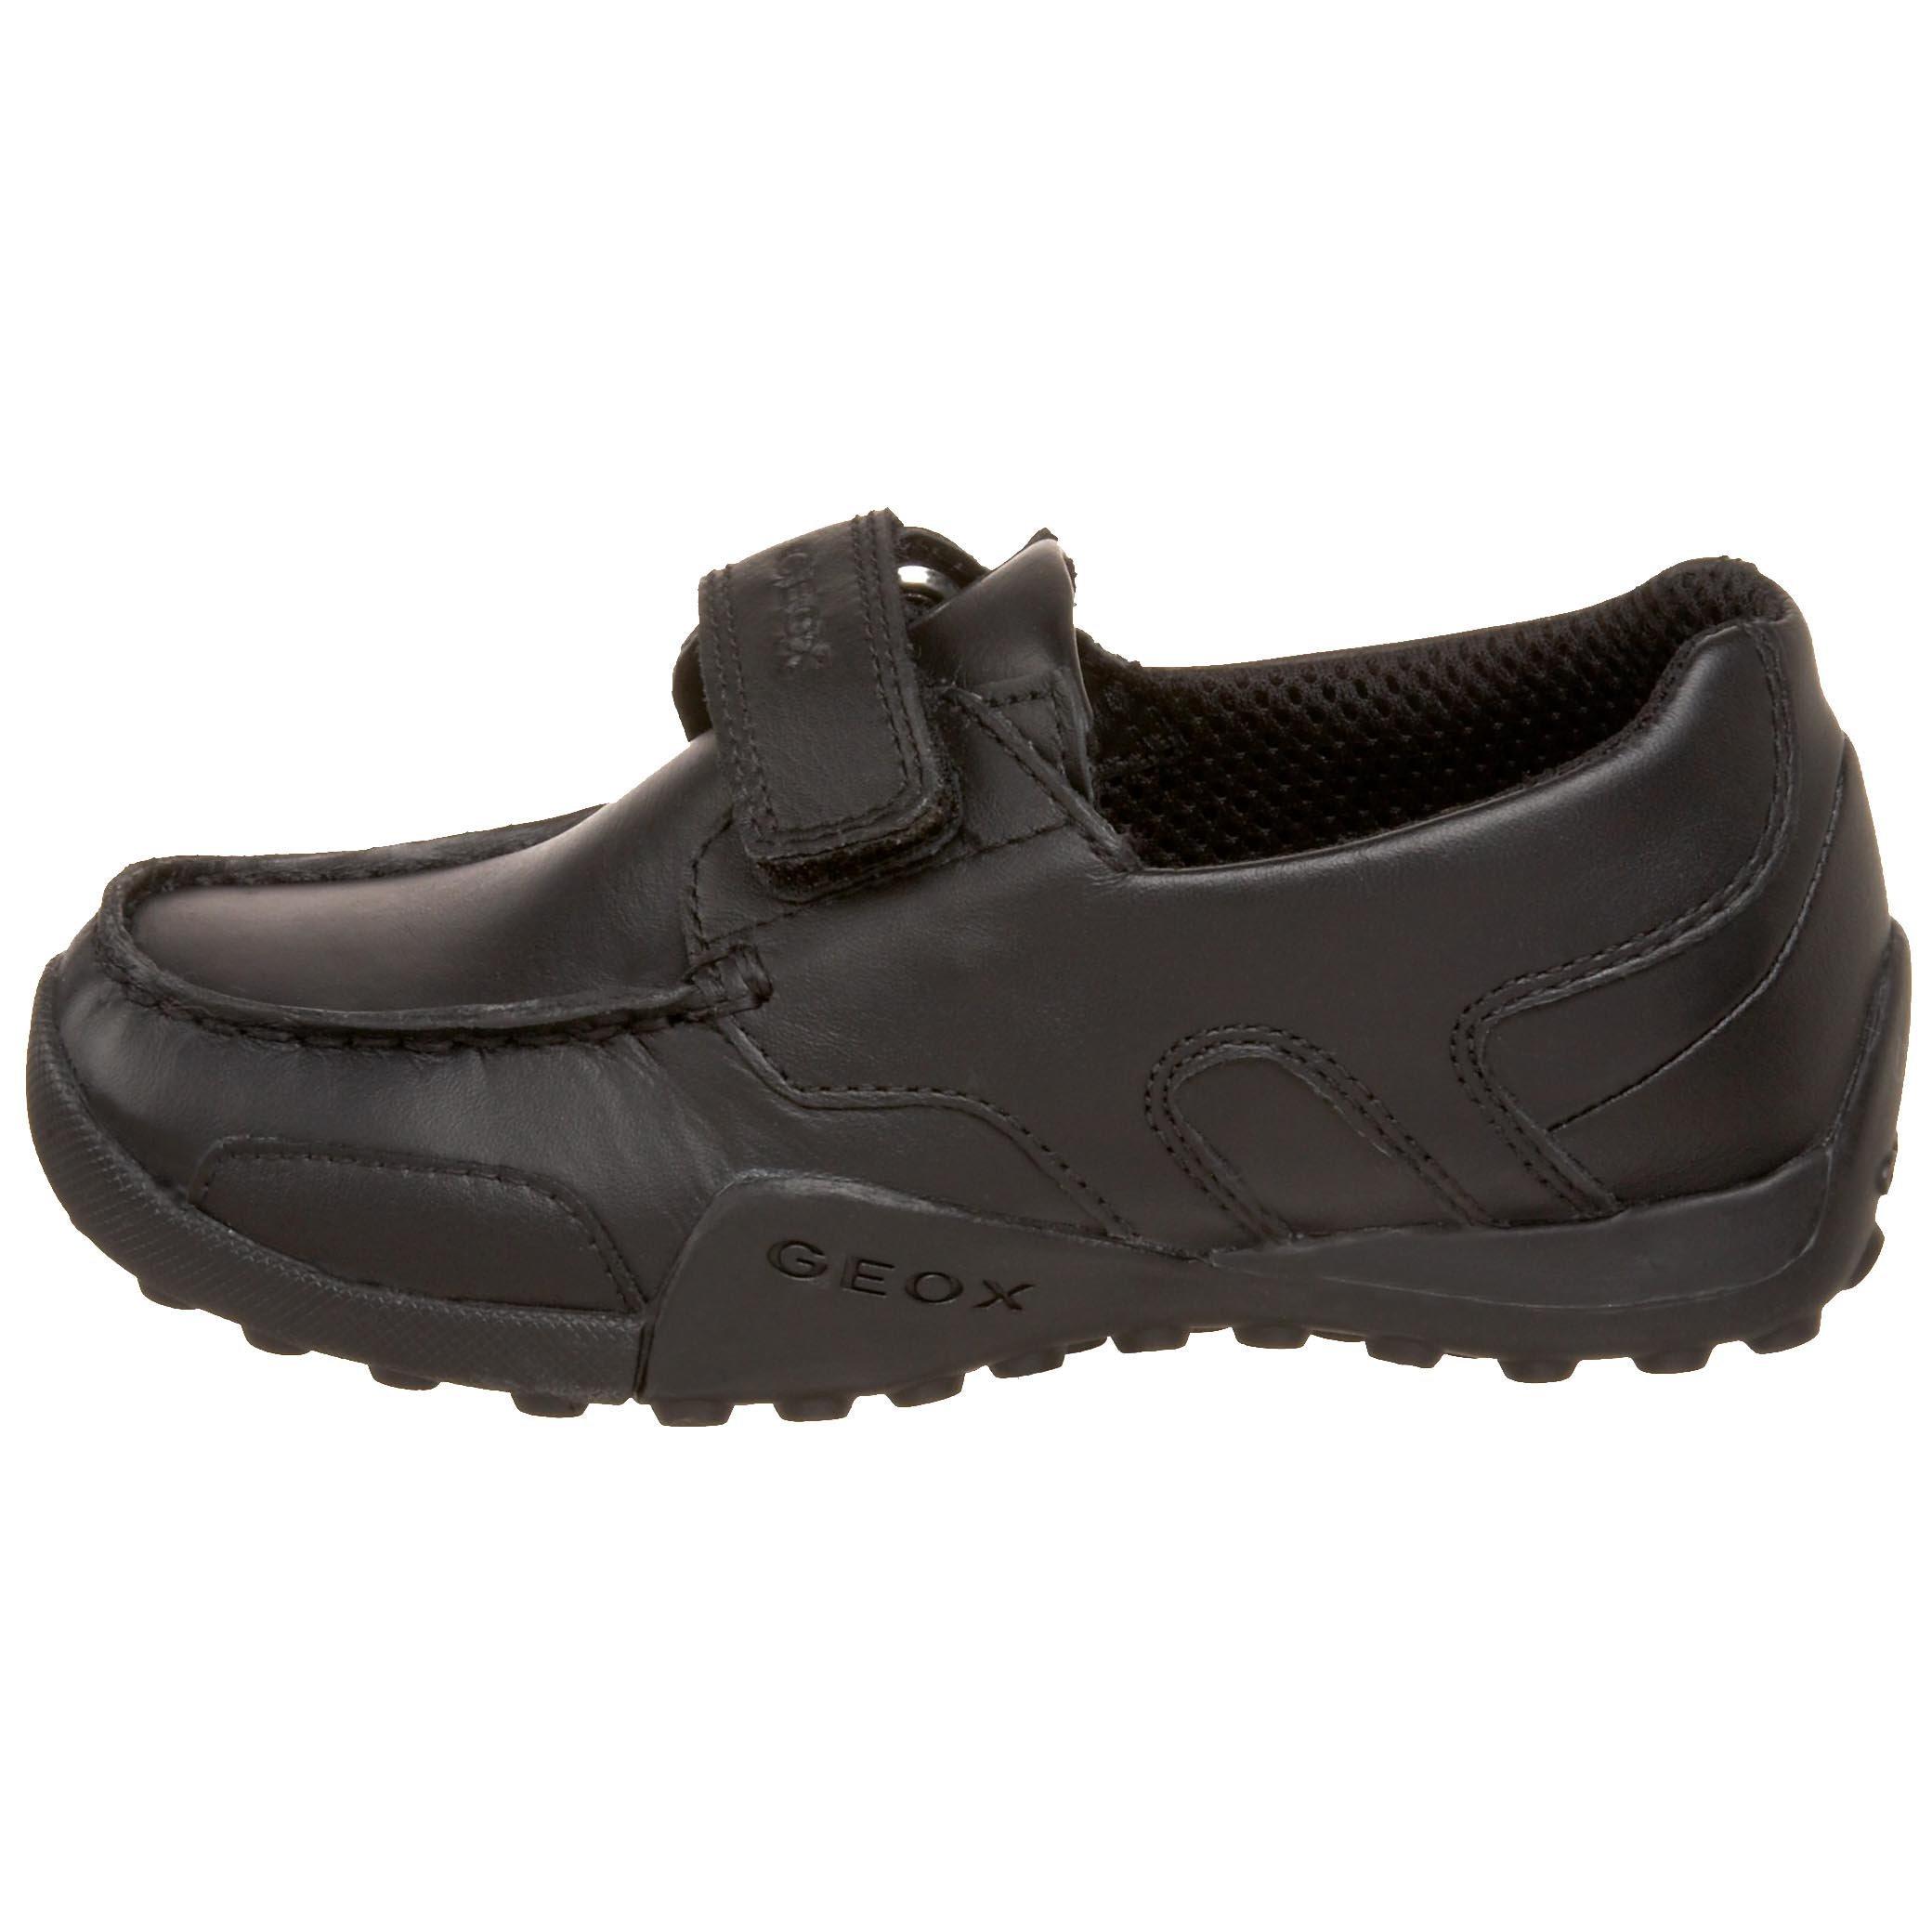 Geox Boy's JR W.SNAKE MOCASSINO Shoe,black,37 M EU Big Kid (5 US) by Geox (Image #5)